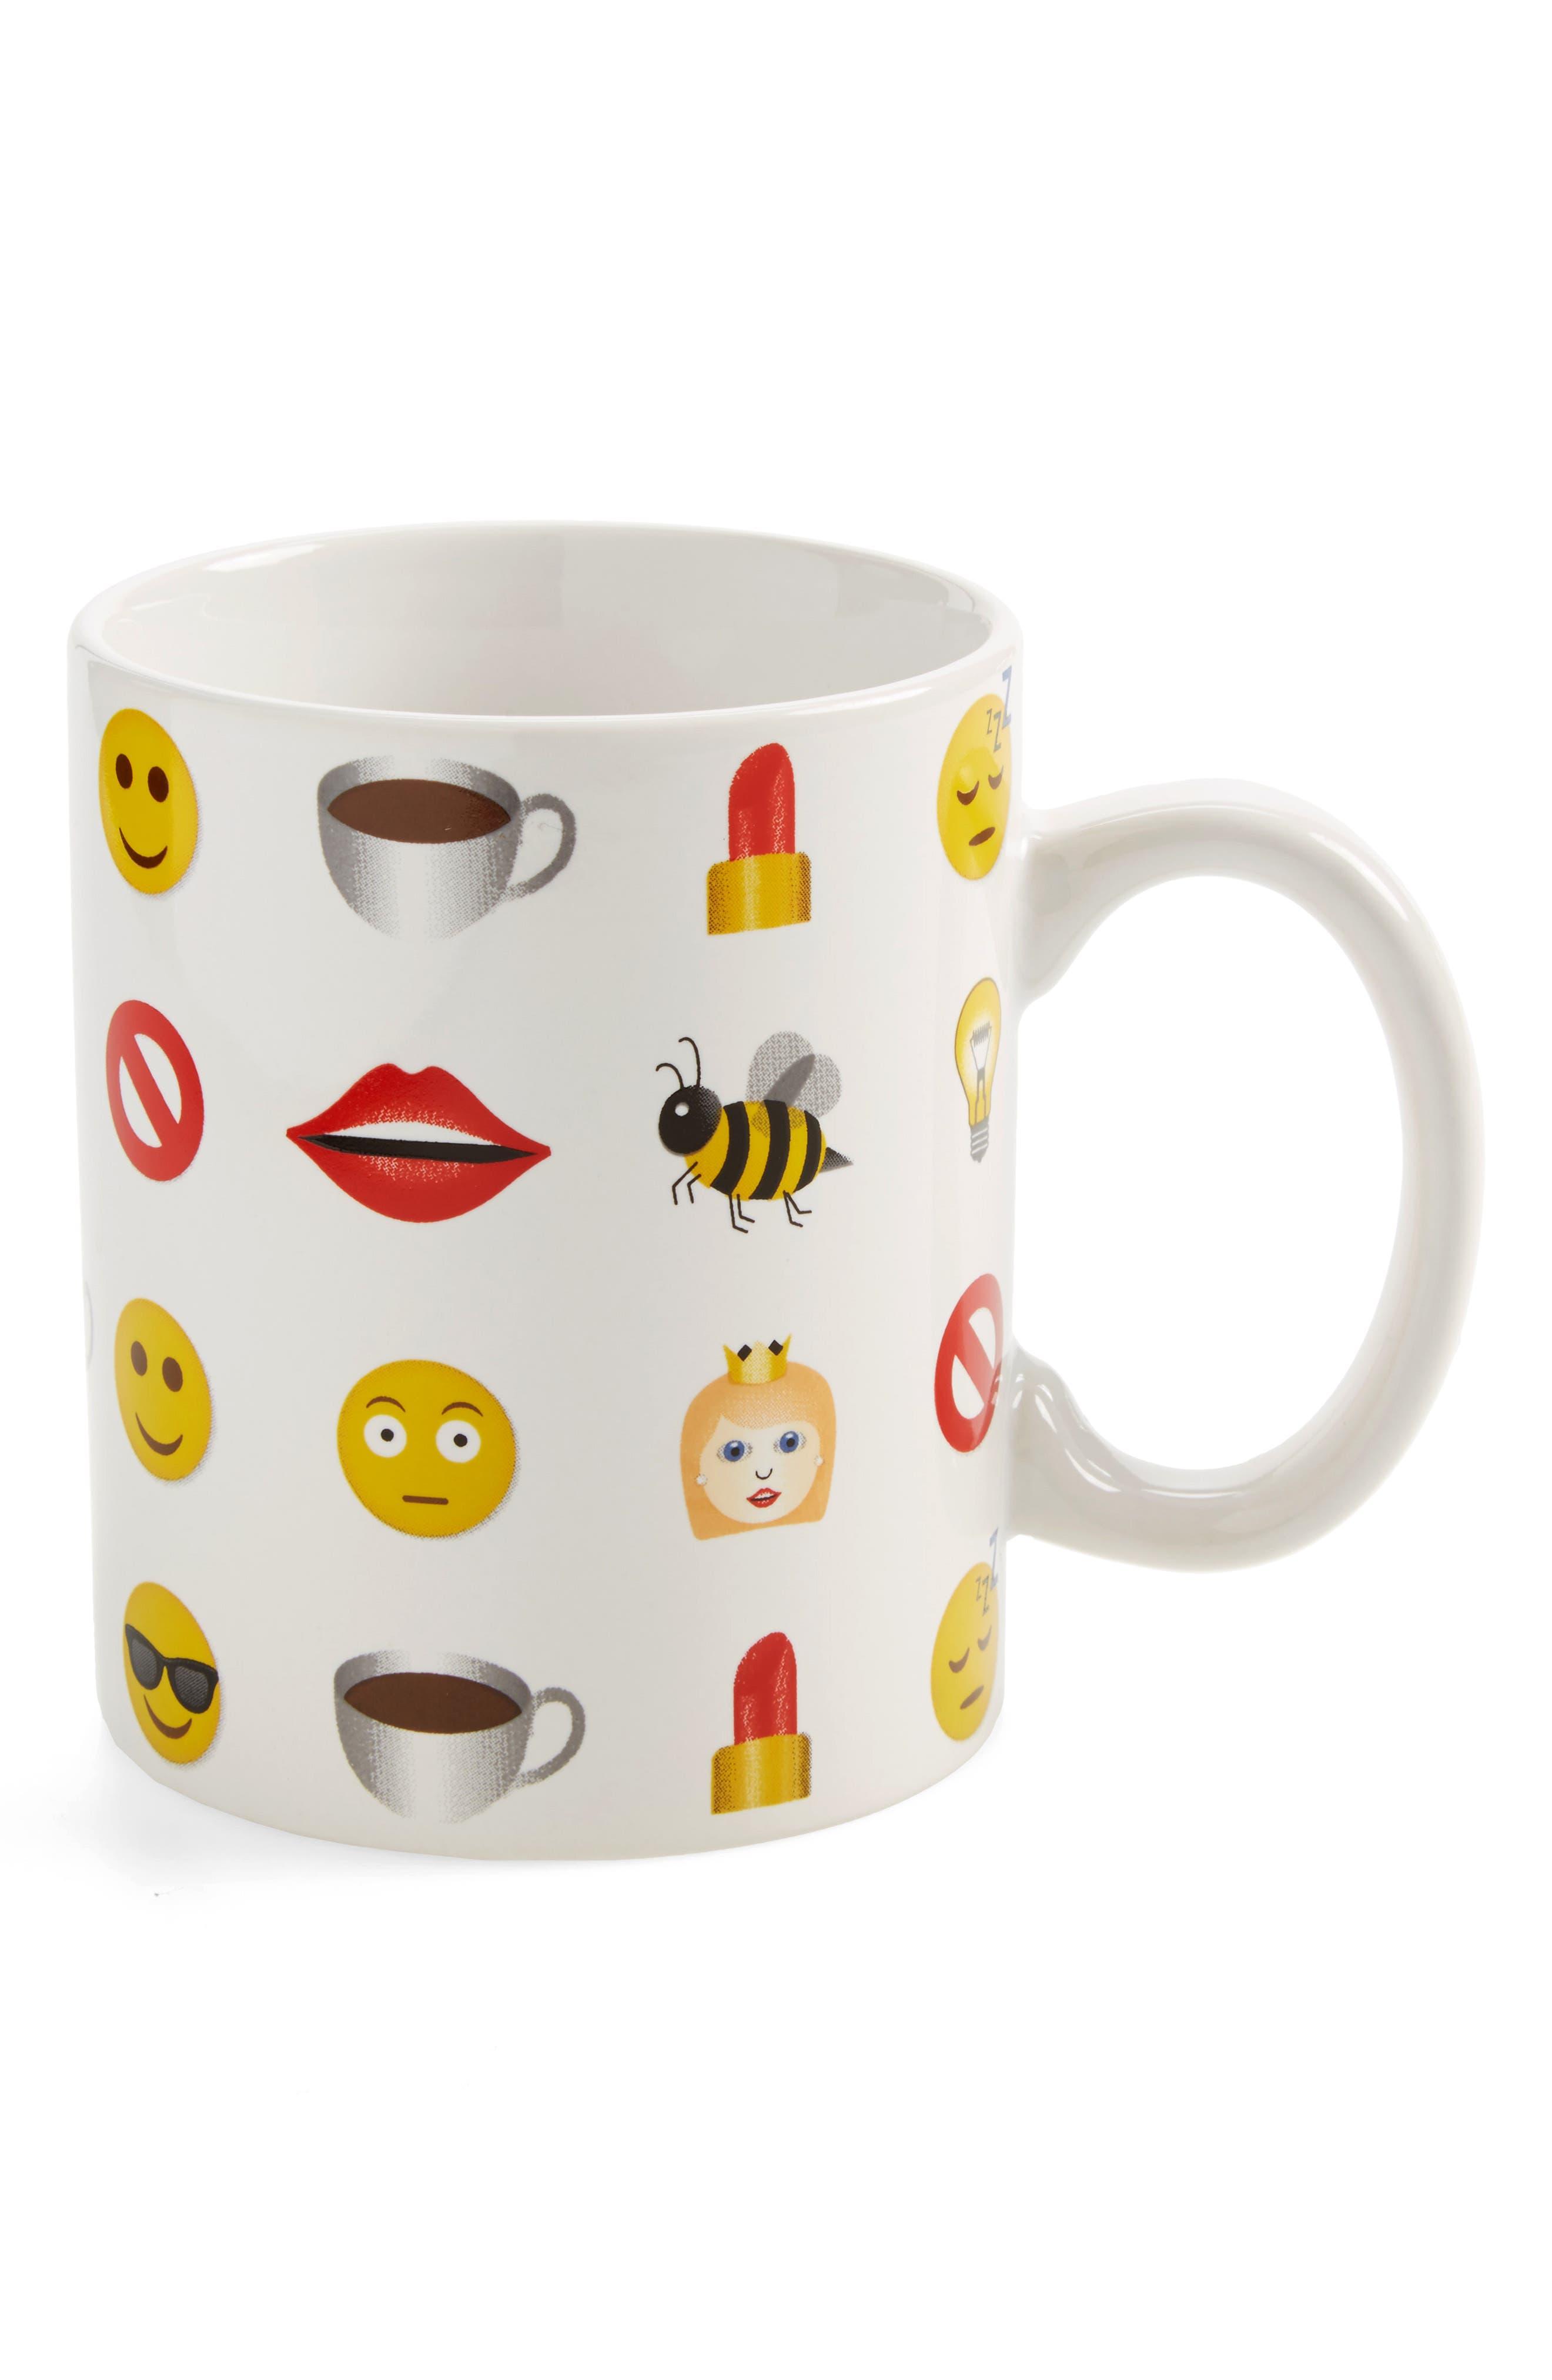 American Atelier Emoji Mug